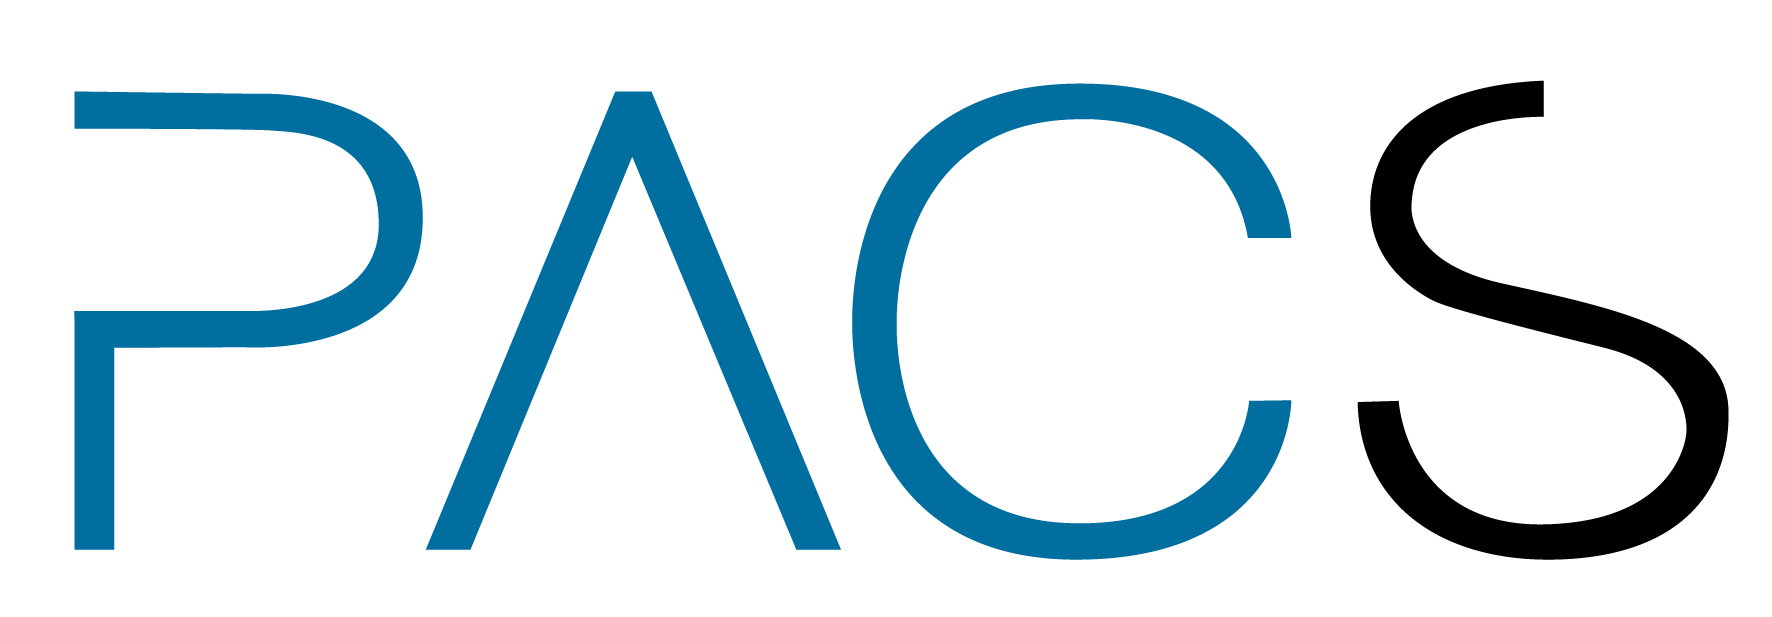 PACS Pharma and Cosmetics